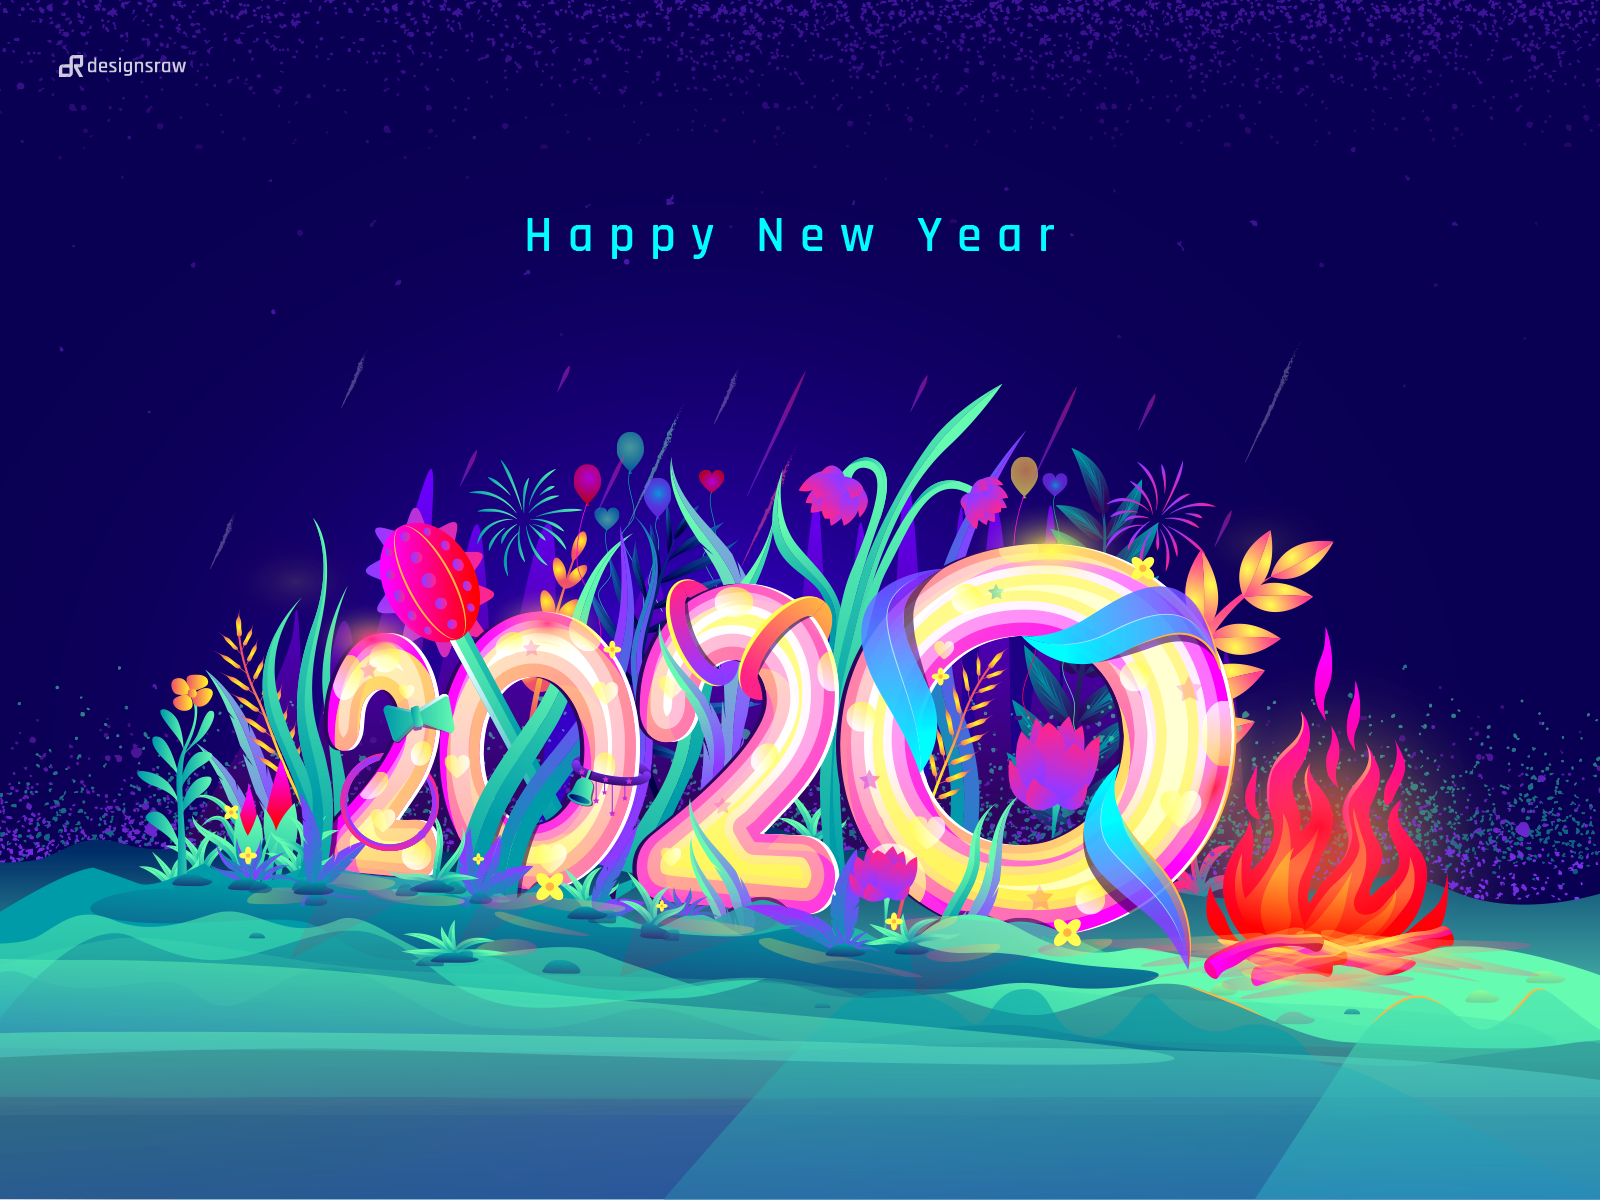 Happy New Year 2020 By Designsraw On Dribbble